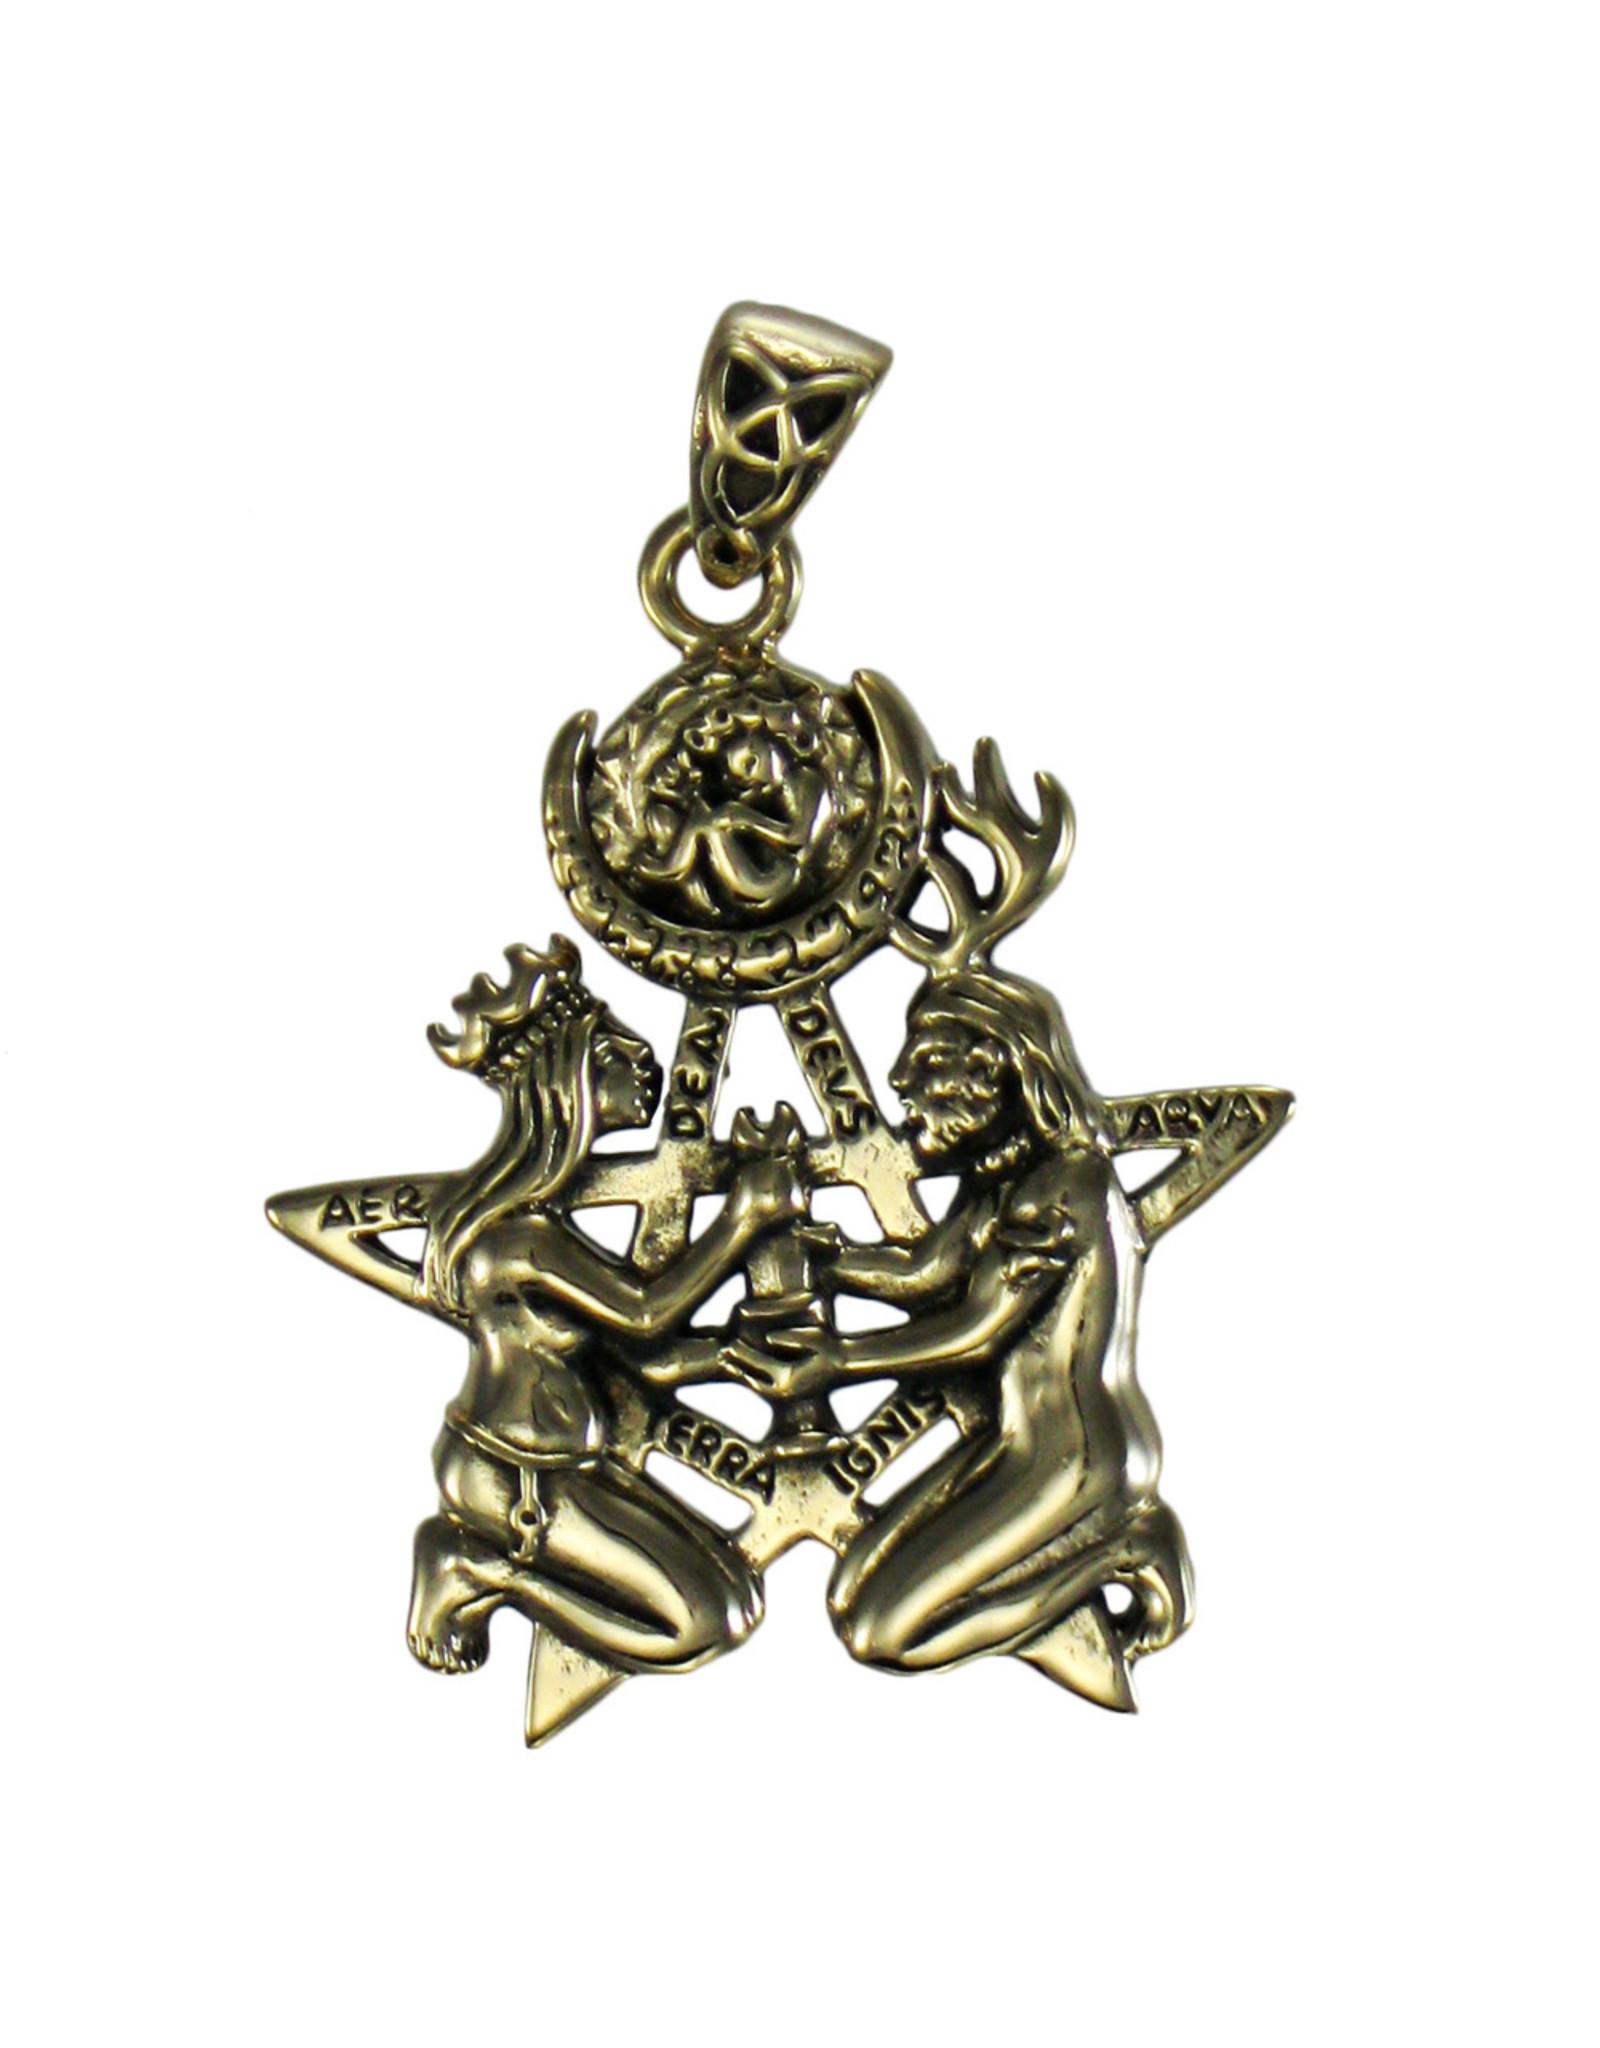 Great Rite Pentacle Pendant in Bronze